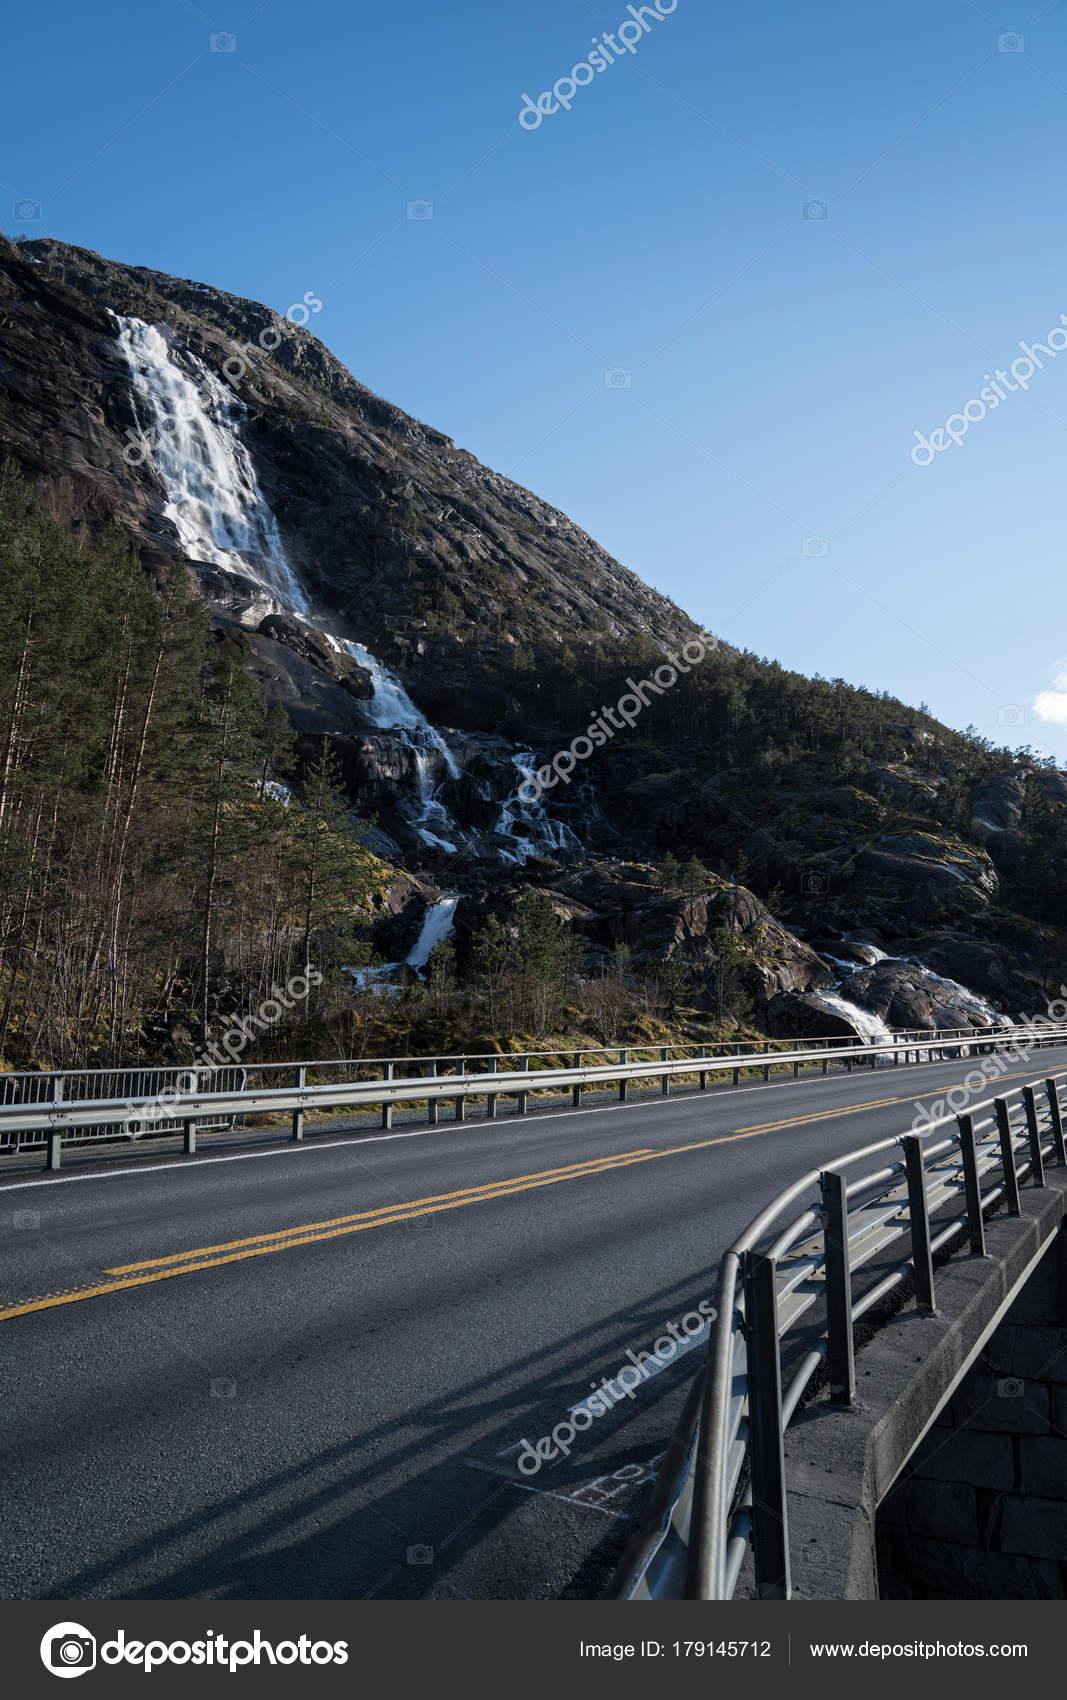 Roads in norway stock photo genlock1 179145712 roads in norway stock photo publicscrutiny Images